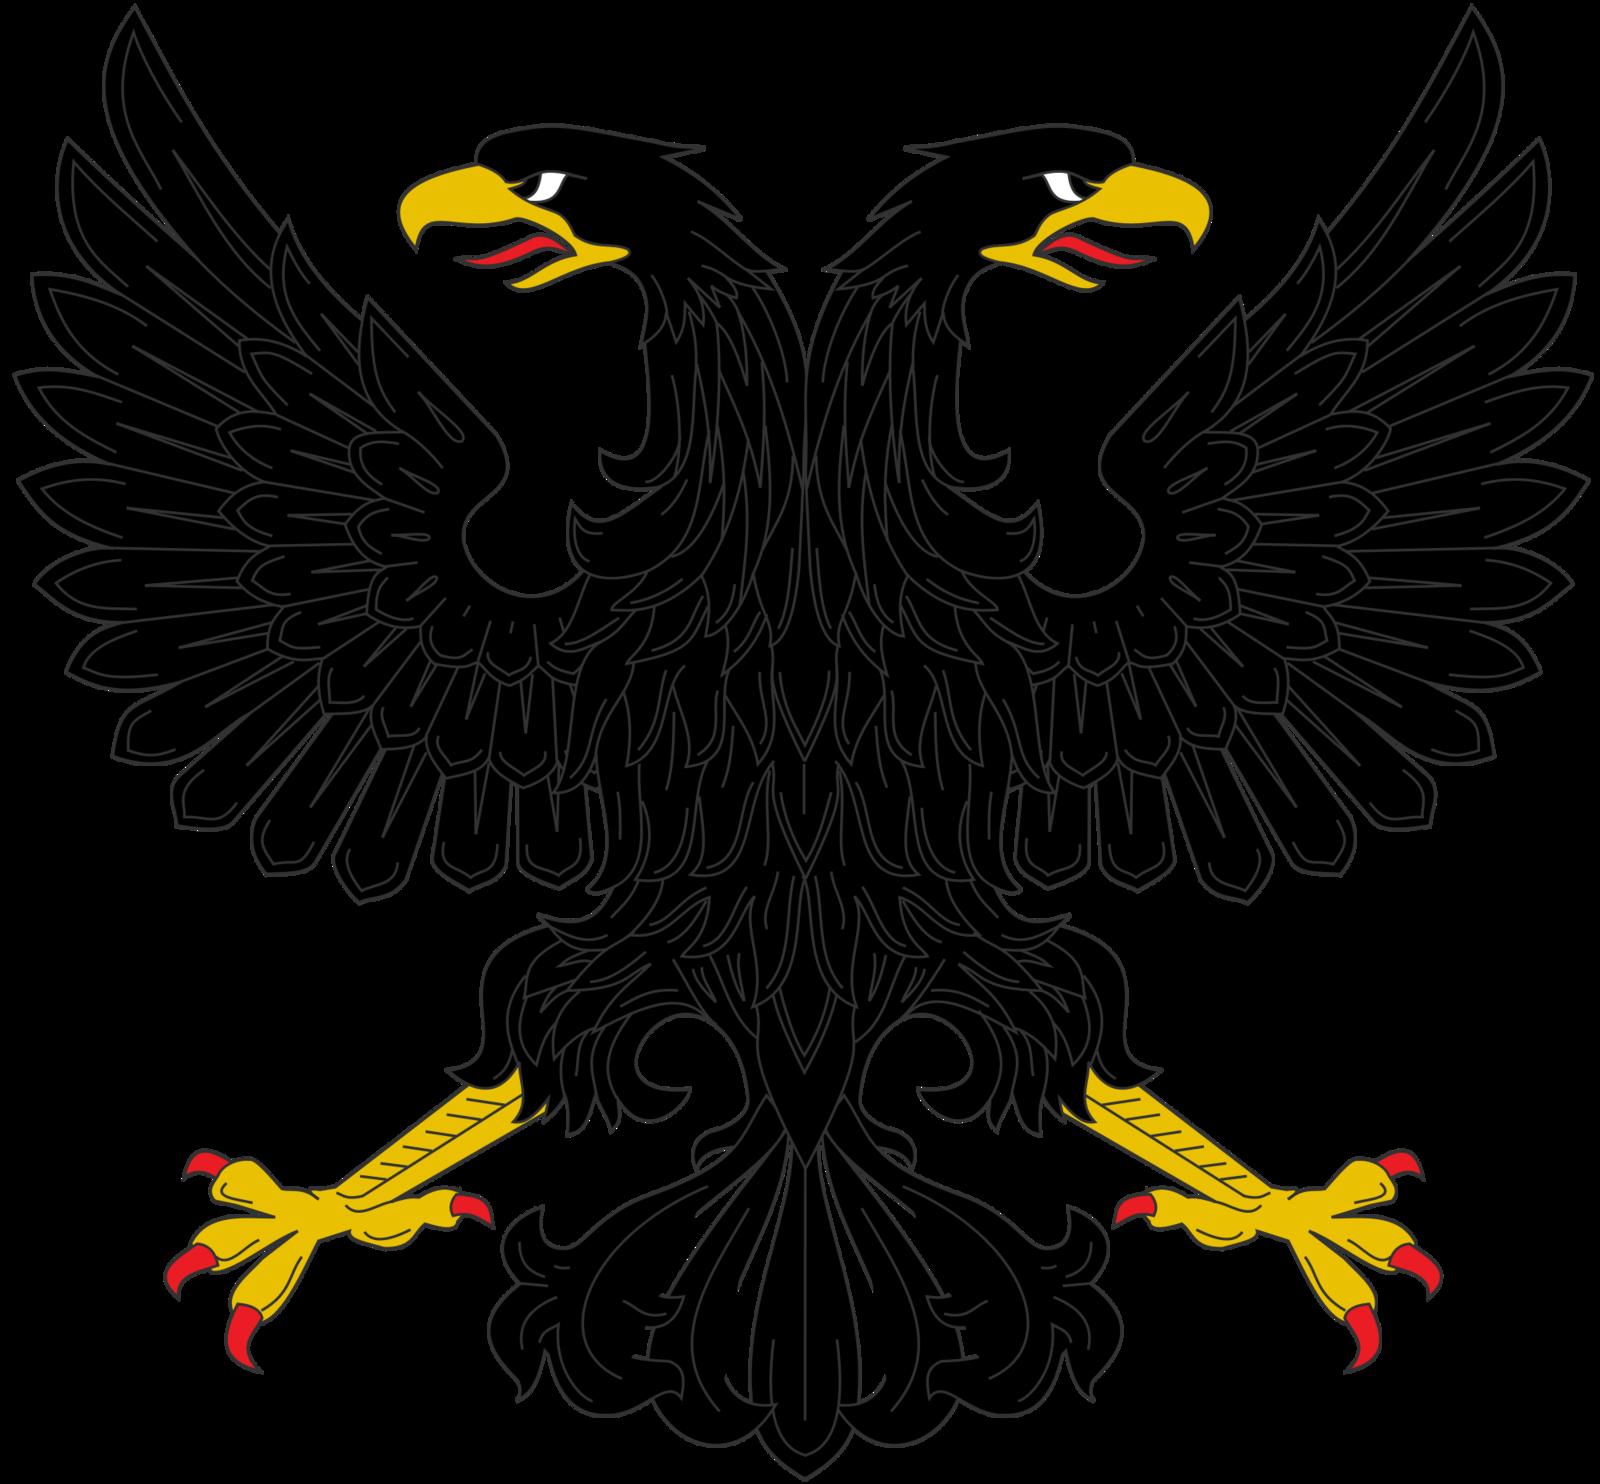 Black Eagle clipart german eagle German photo#2 Headed Eagle headed